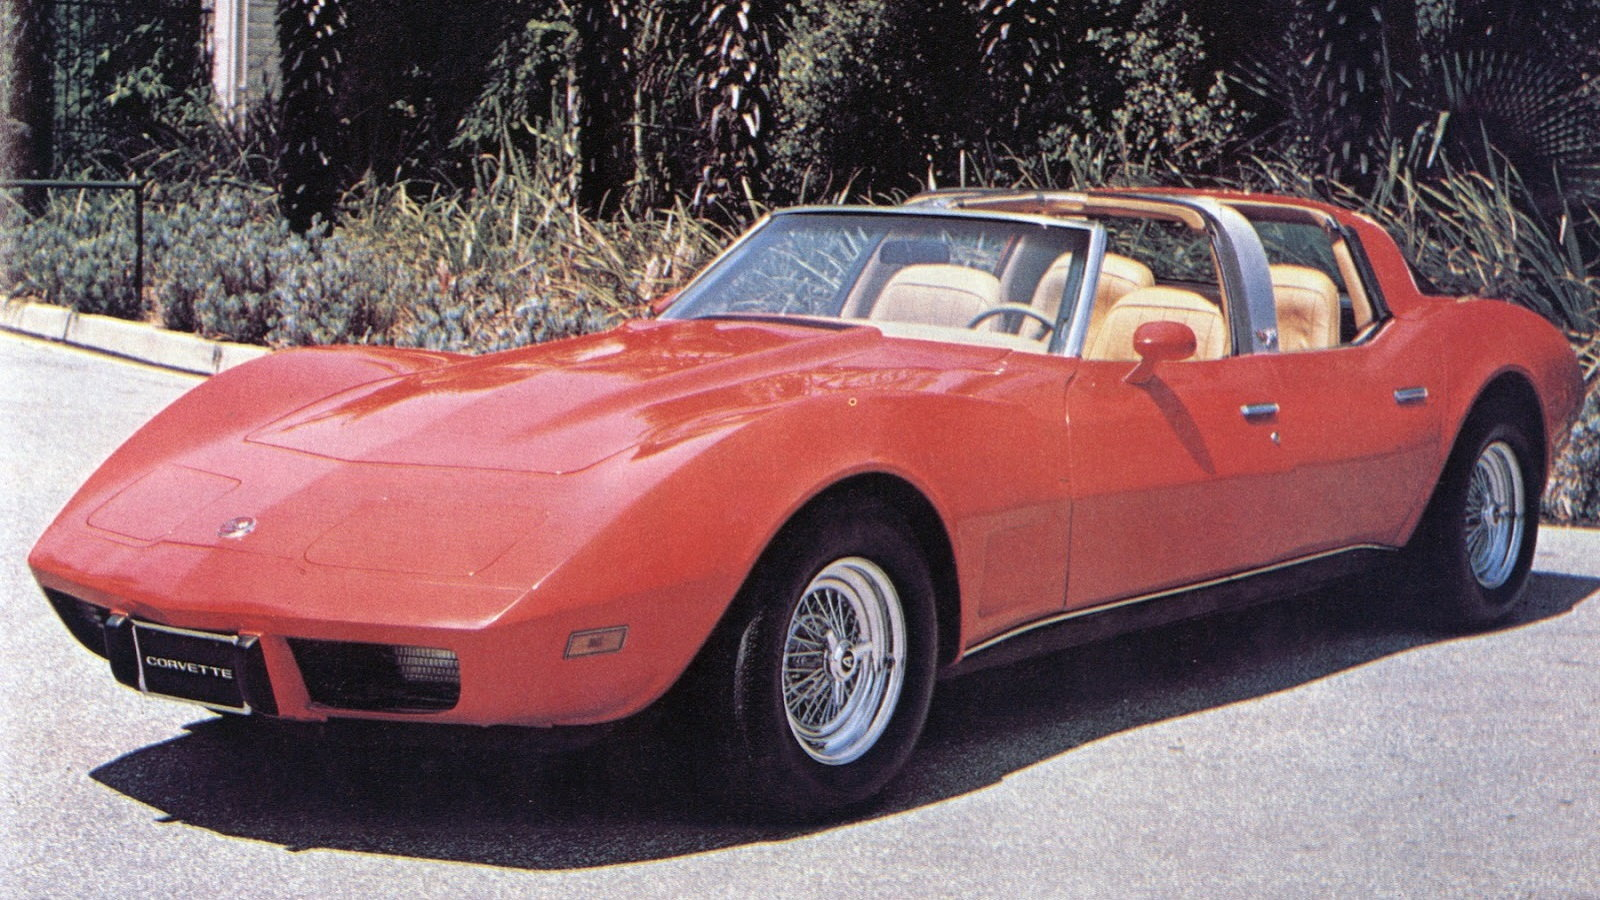 Four Door Corvette, Corvette C3, Conversion